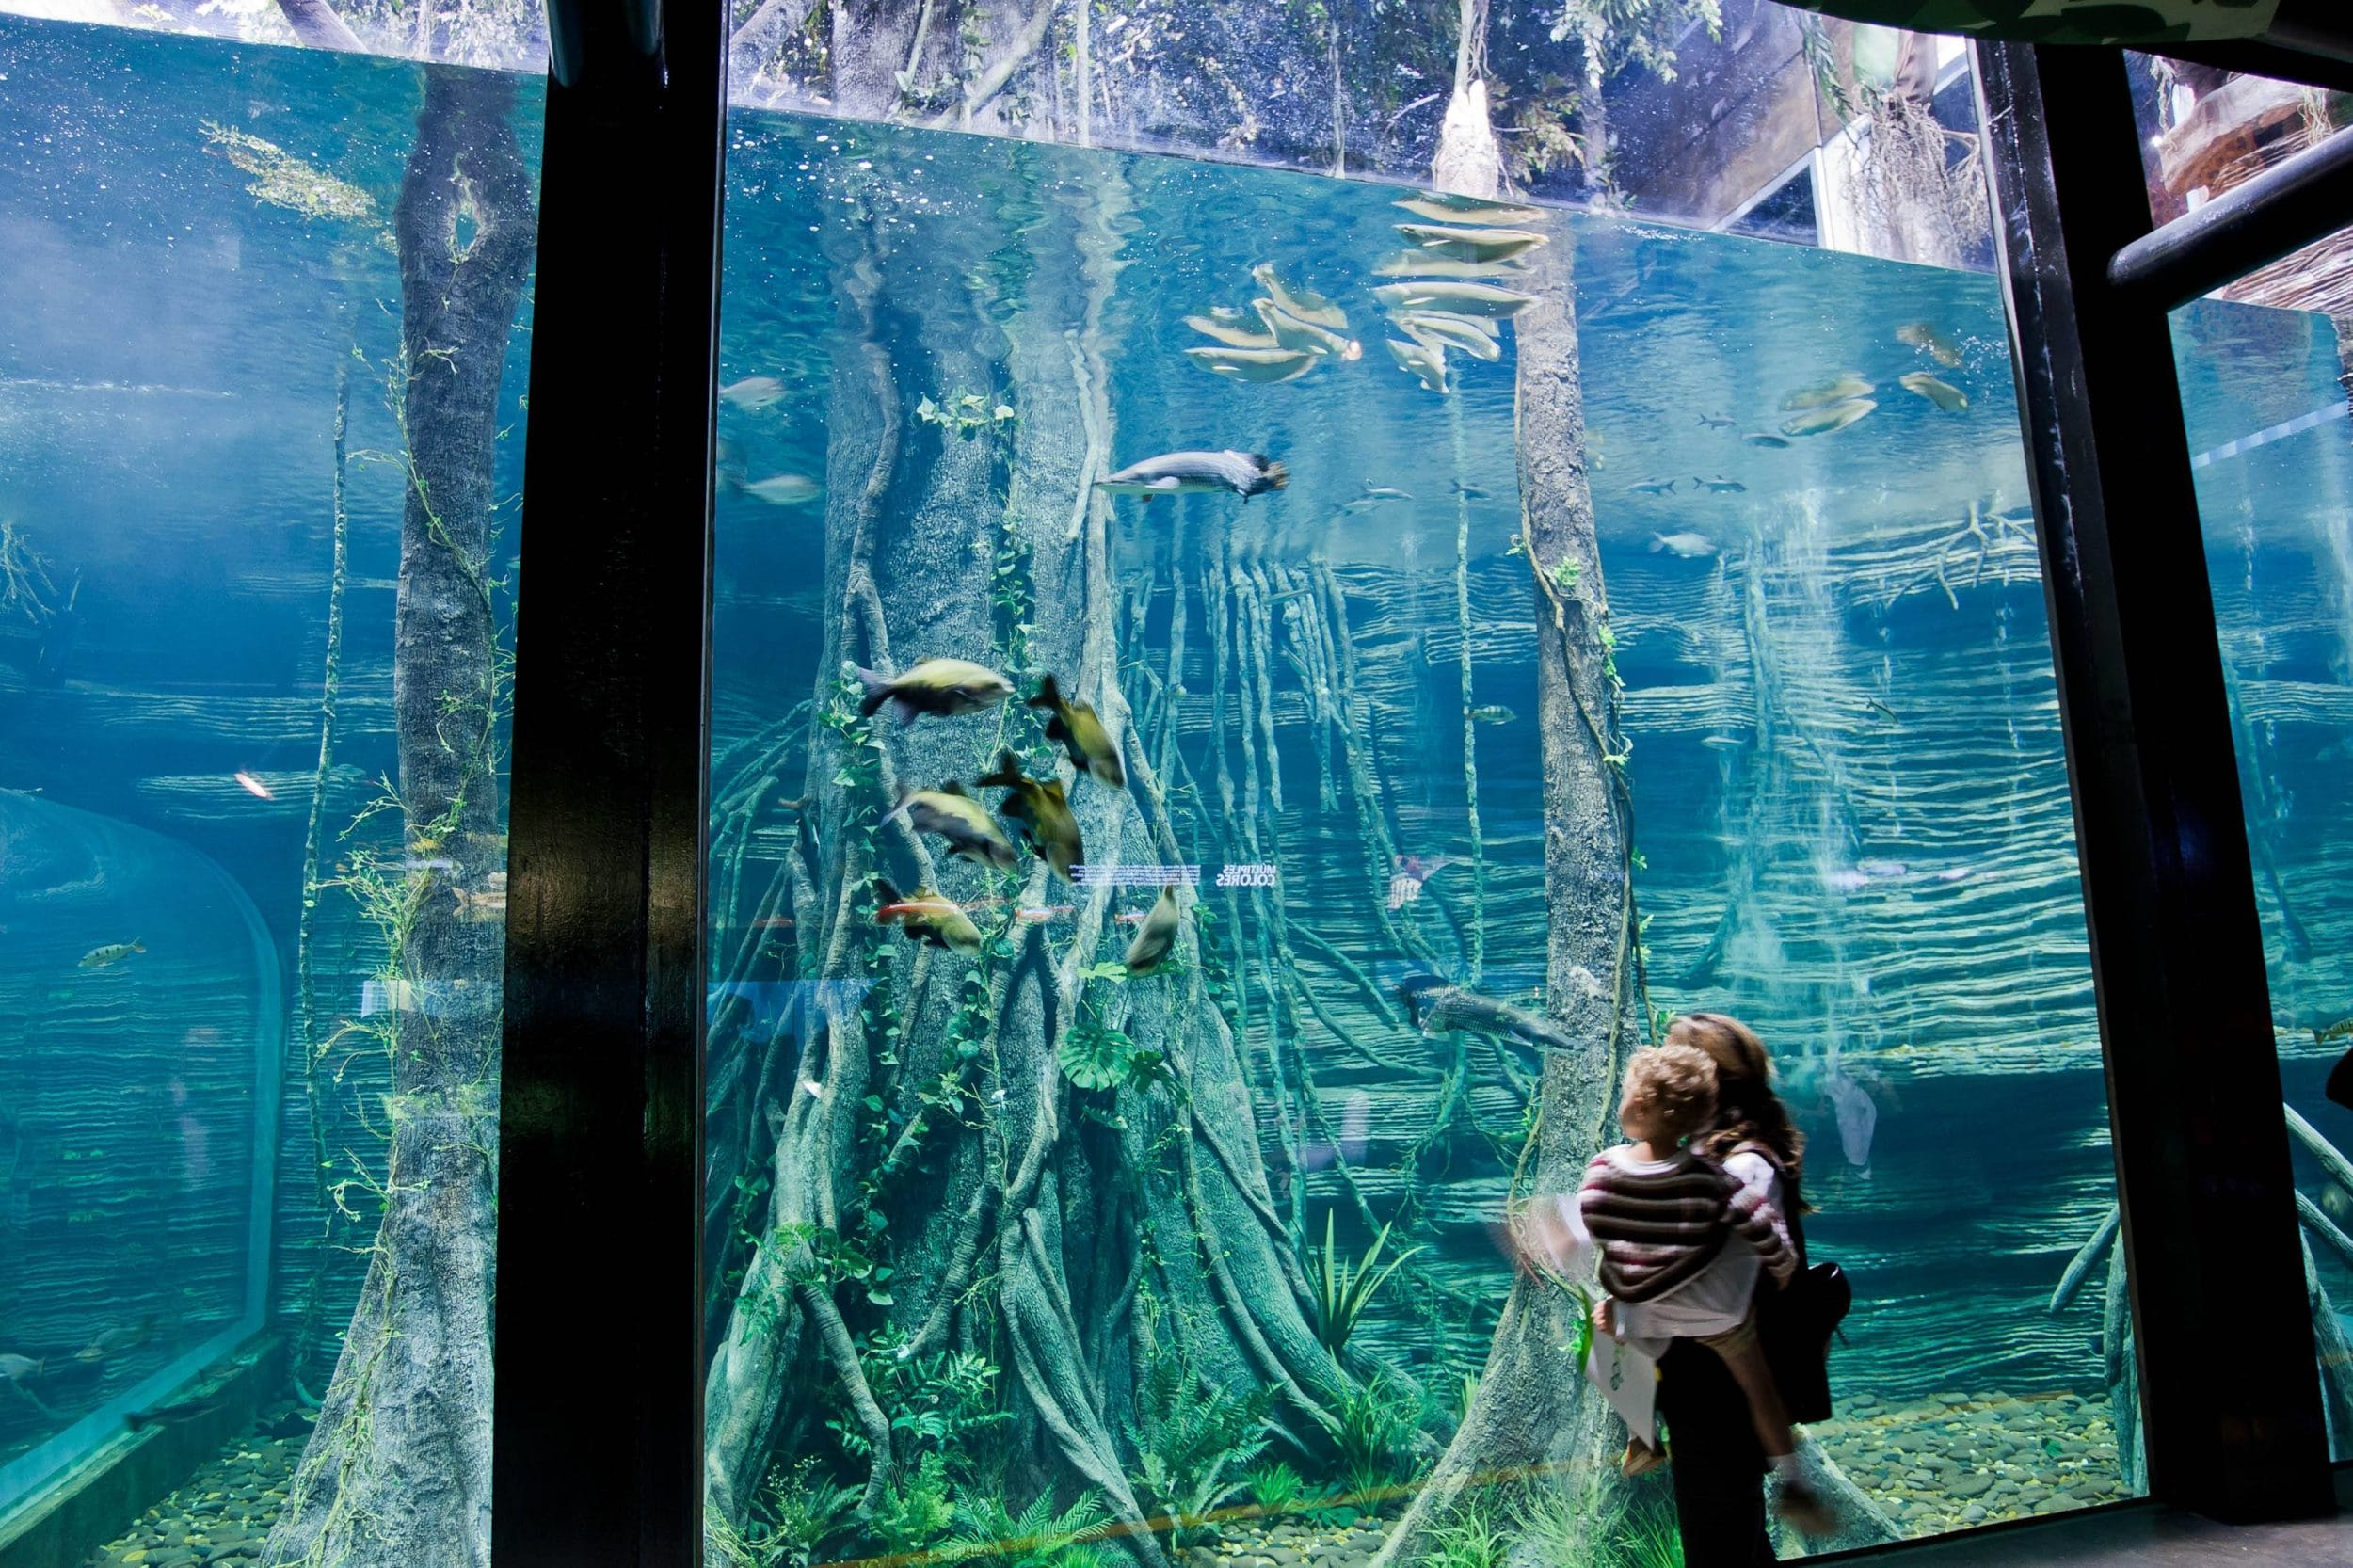 Parque Explora in Medellín, Colombia has an aquarium and planetarium.